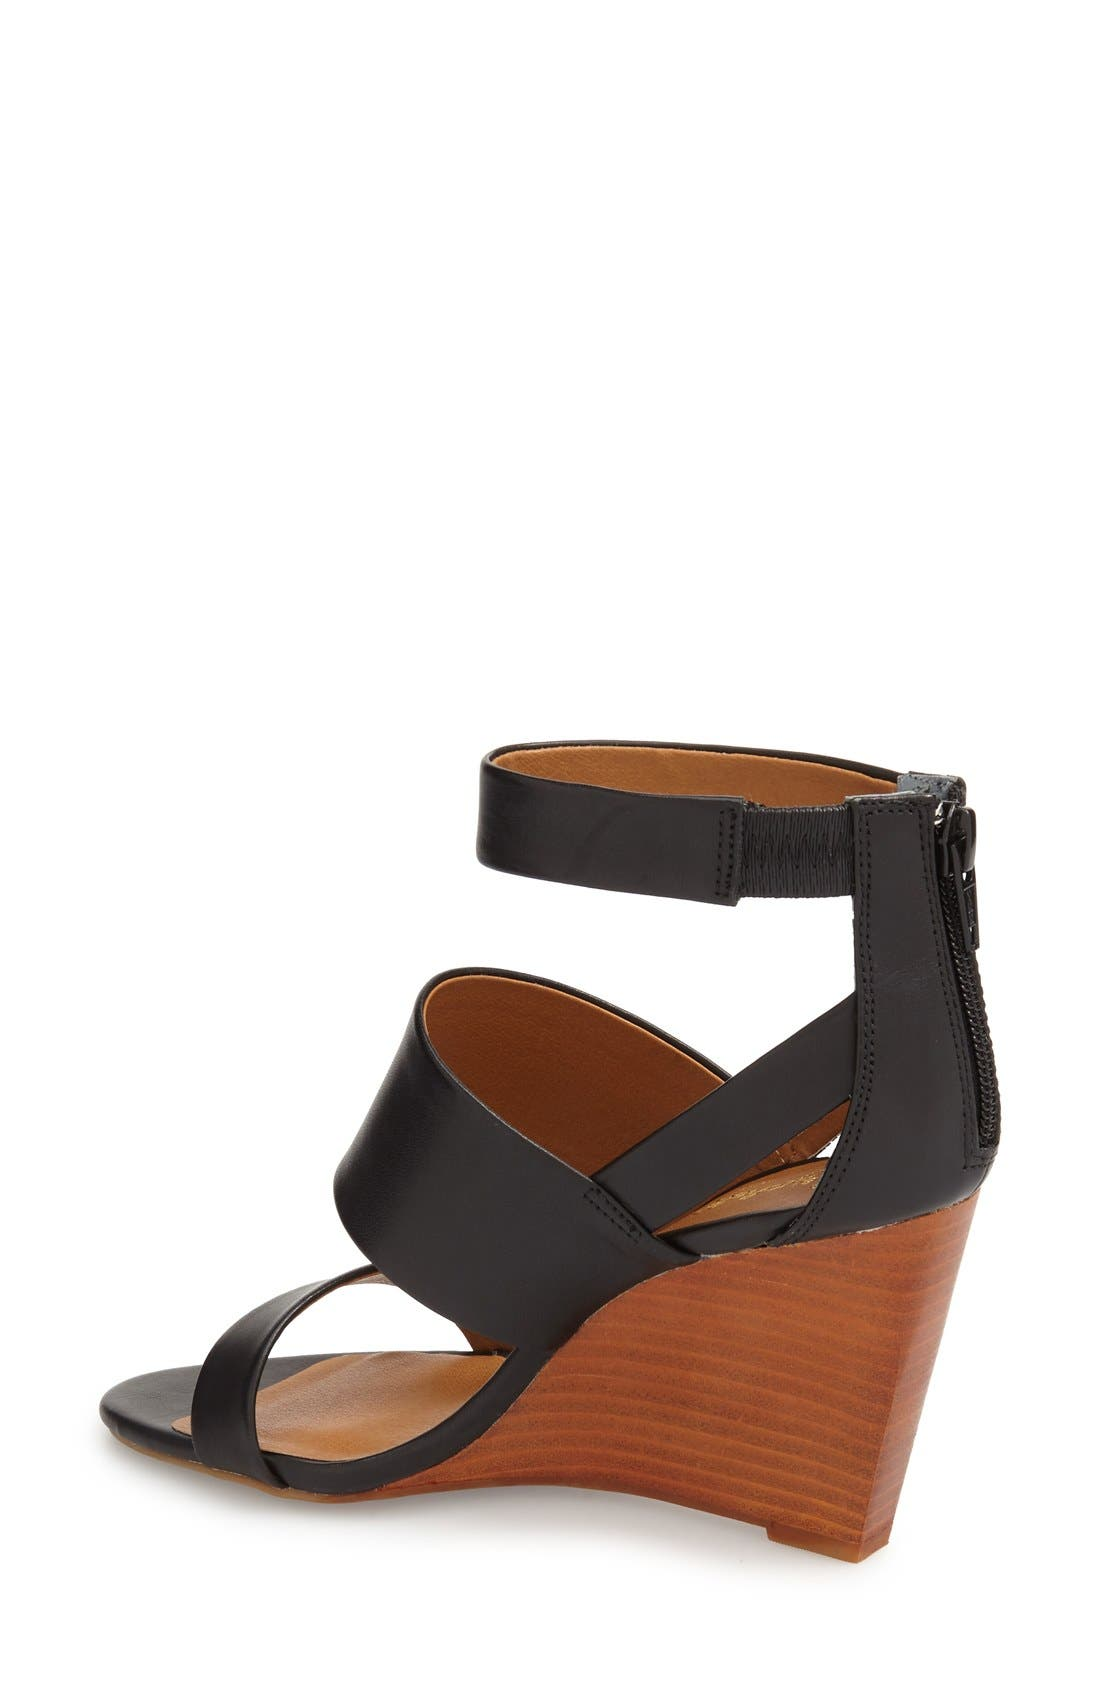 'Suave' Wedge Sandal,                             Alternate thumbnail 2, color,                             001